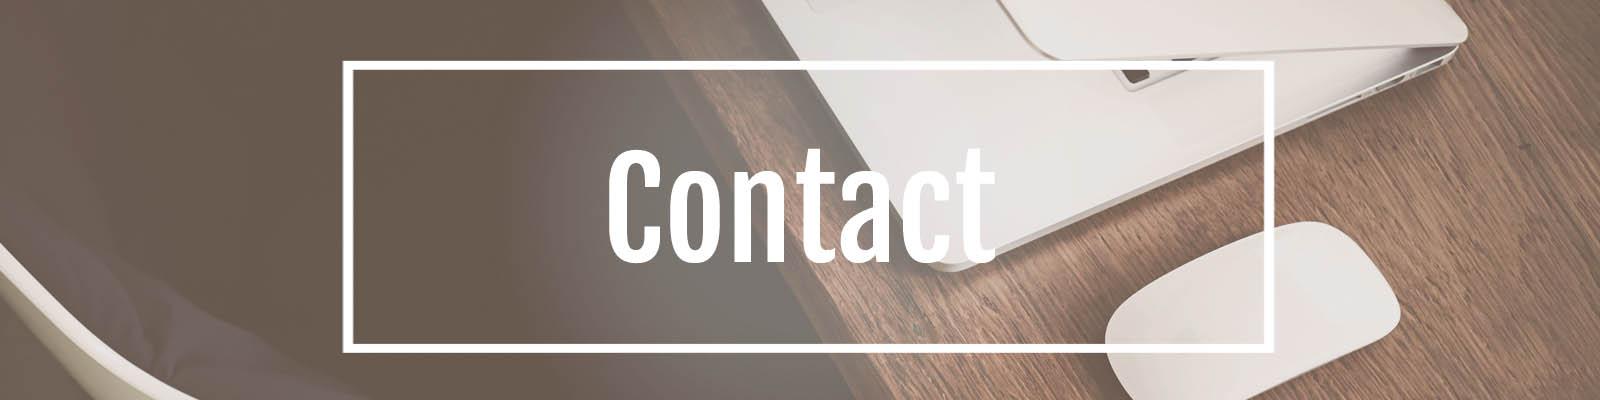 Fellowship-Bible-Church-Palmyra-Wisconsin-Contact-Header.jpg